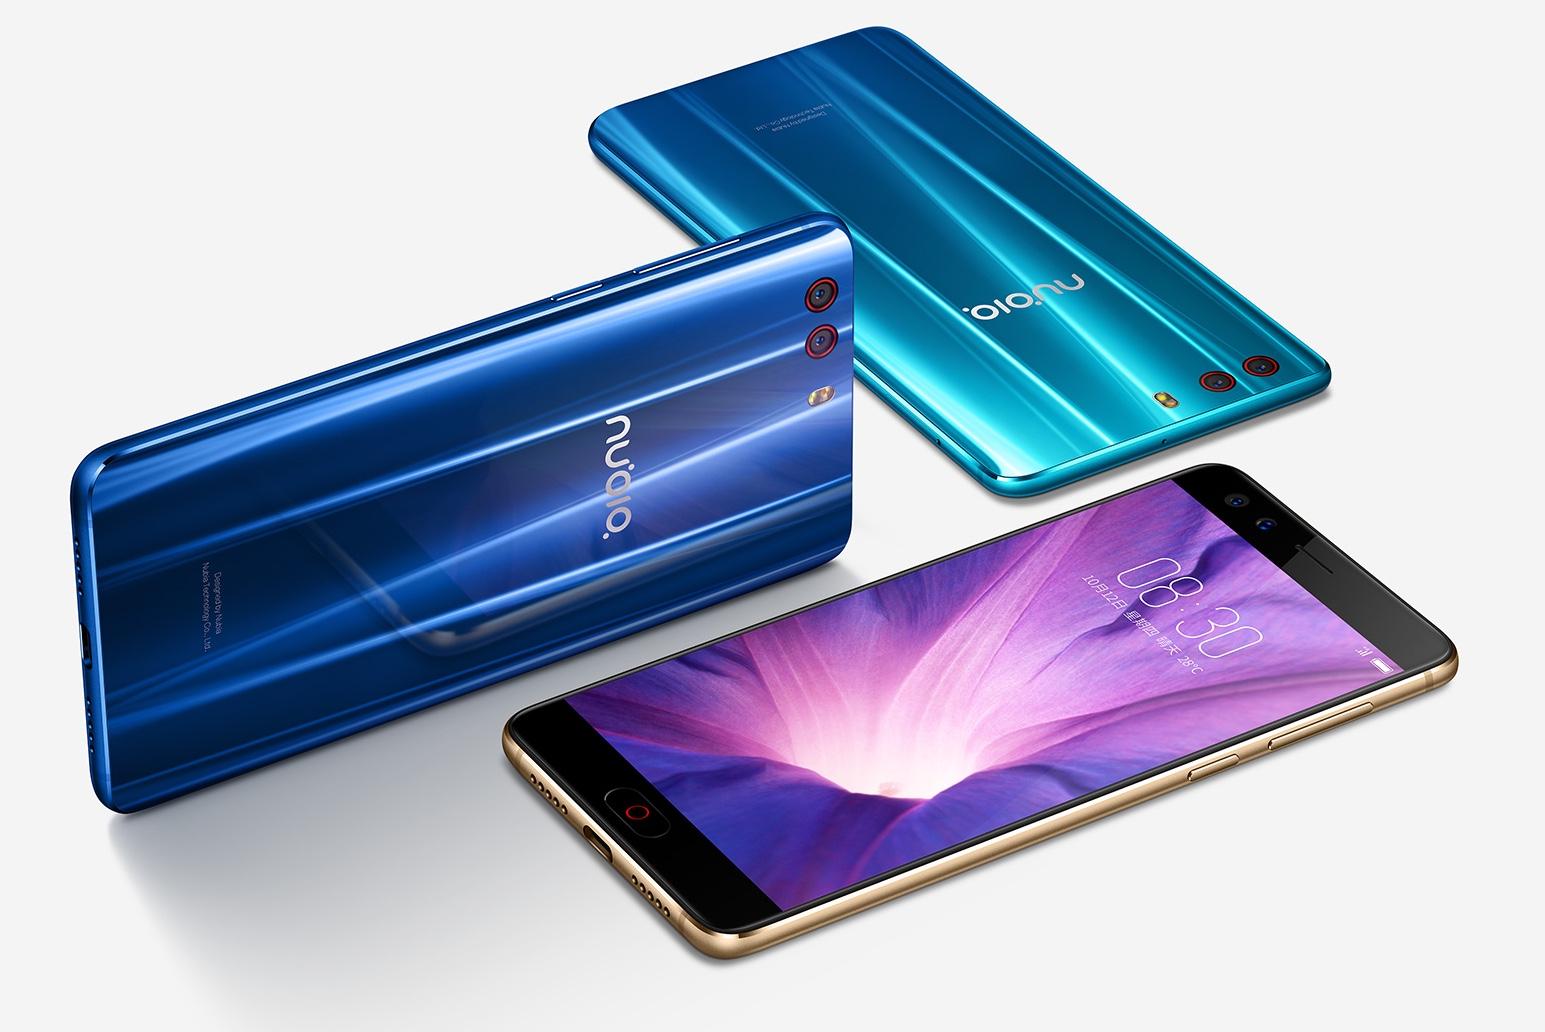 Смартфон ZTE Nubia Z17 miniS получил четыре камеры